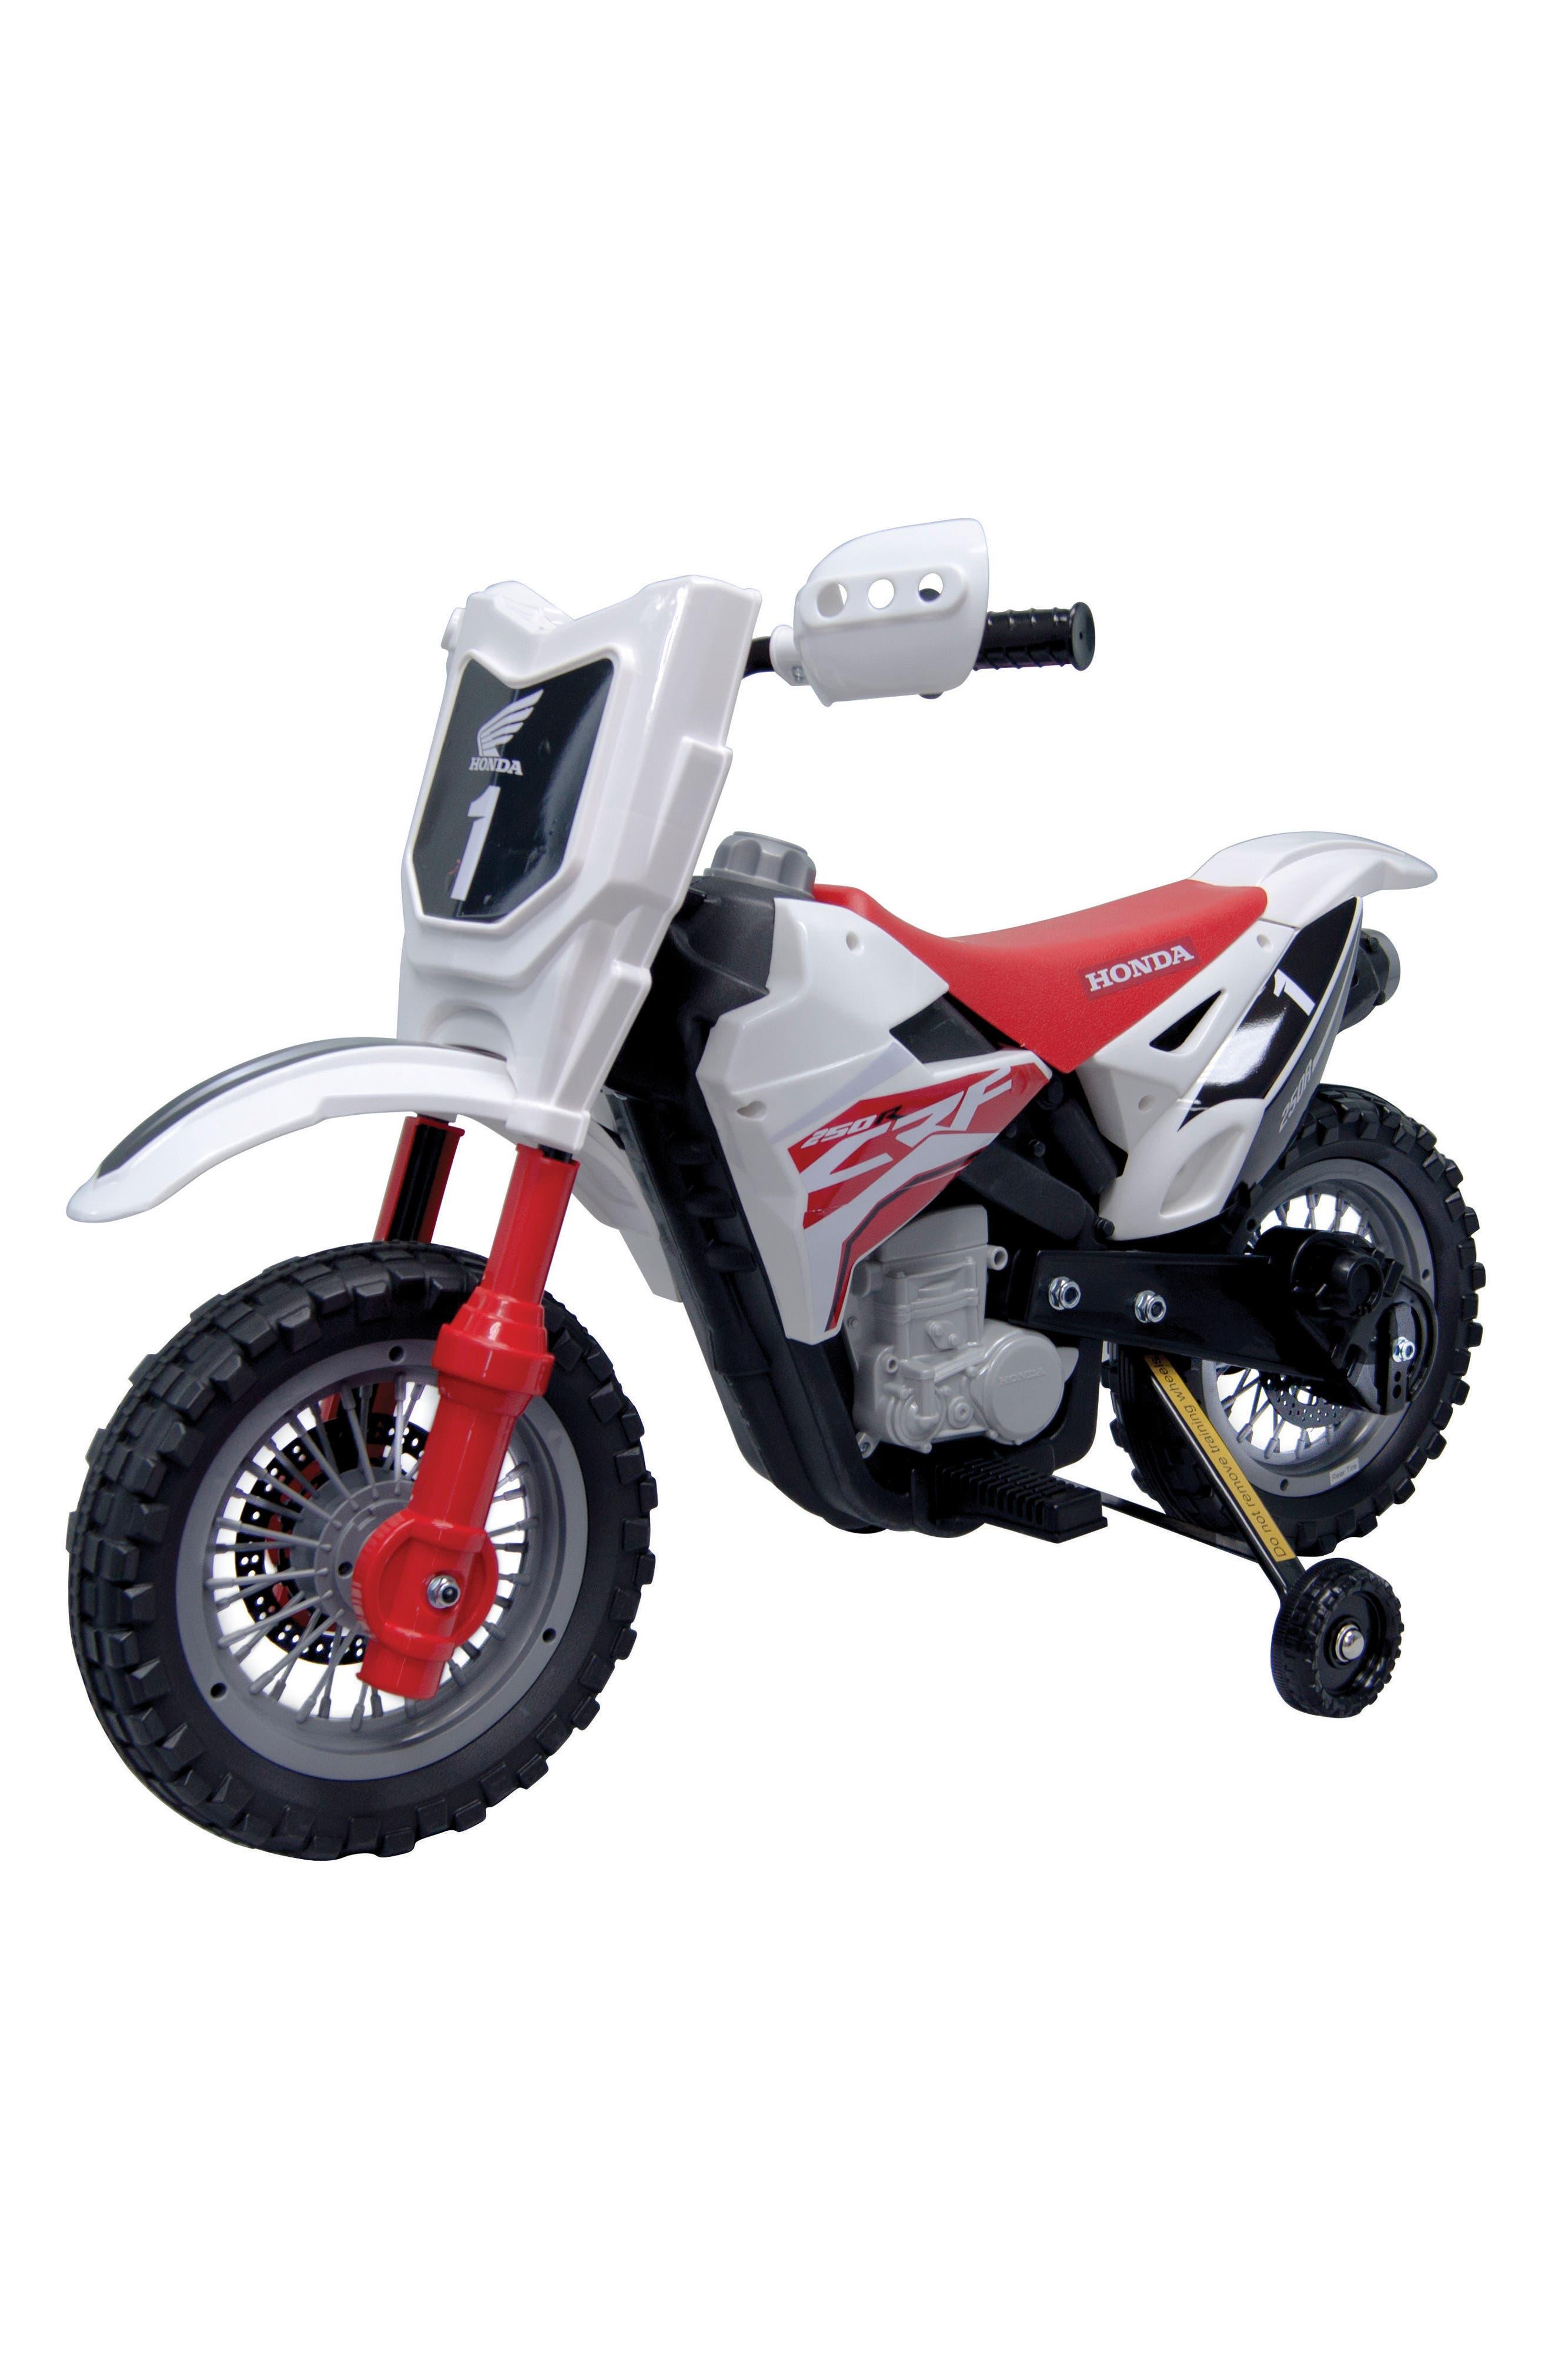 Best Ride on Cars Honda Dirt Bike Ride-On Toy Motorcycle